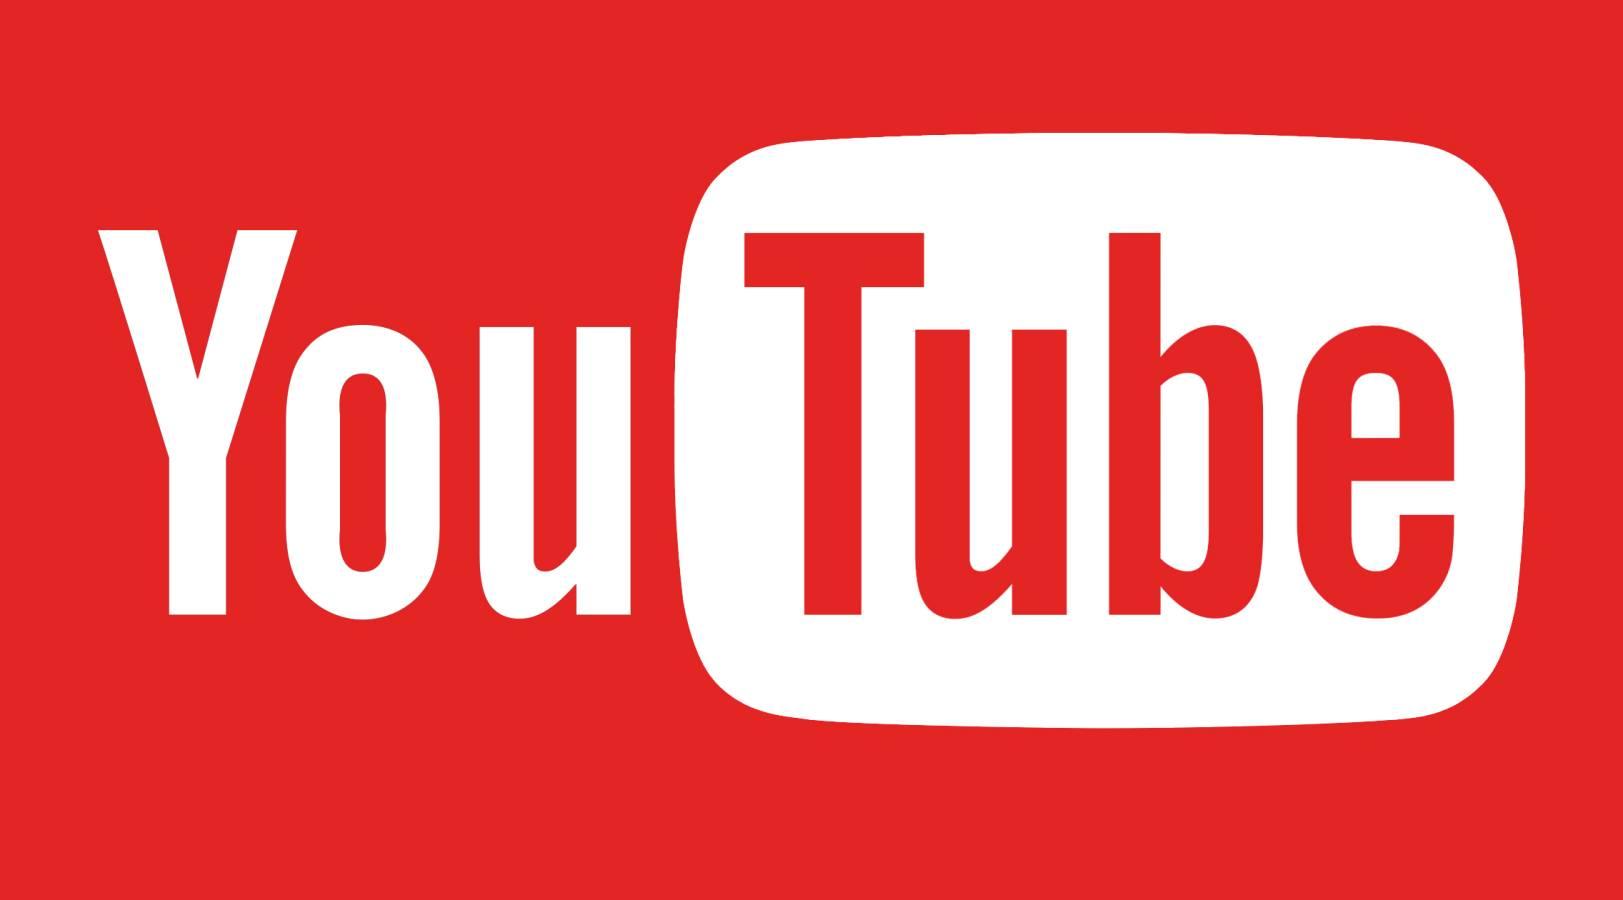 Update nou pentru aplicatia YouTube lansat astazi